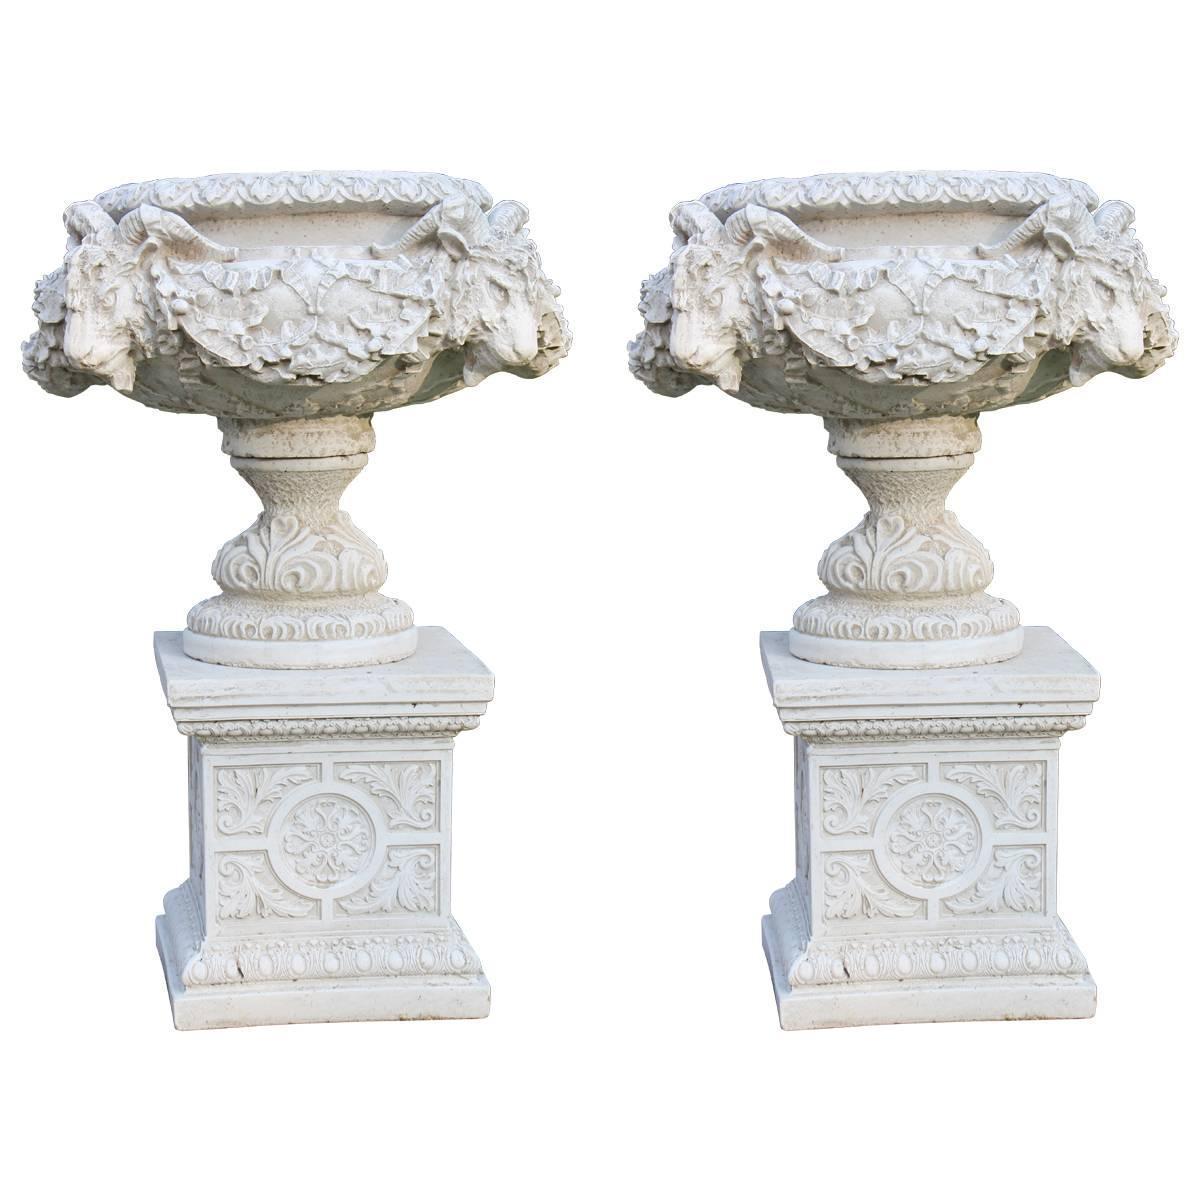 Pair Of Heavy Composite Stone Ram S Head Garden Urns On